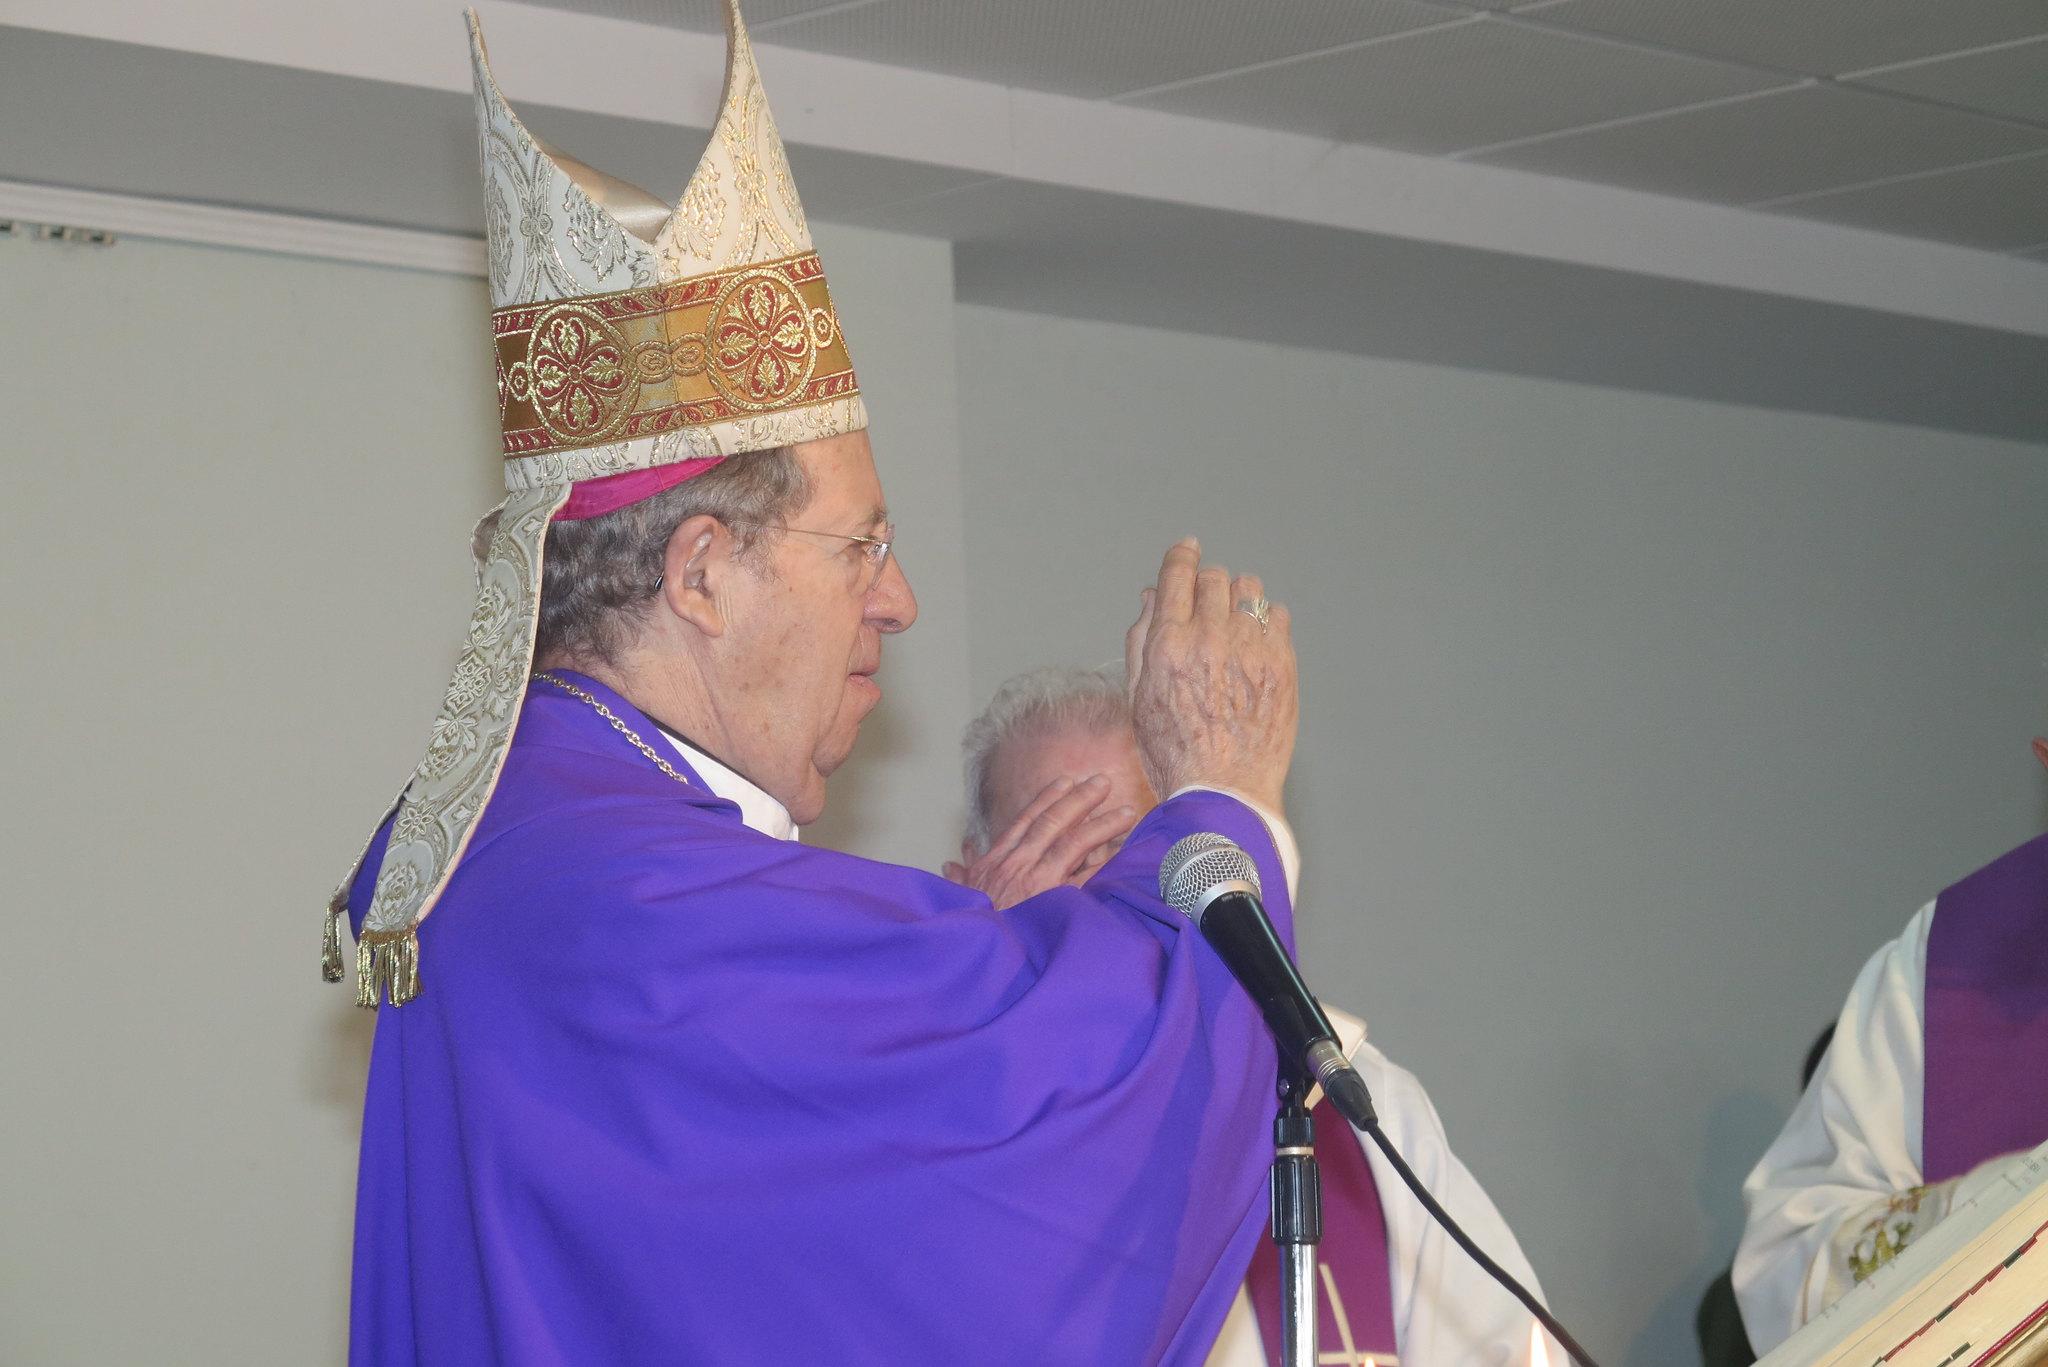 (2016-02-13) - Inauguración Virgen de Lourdes, La Molineta - Archivo La Molineta 2 (39)